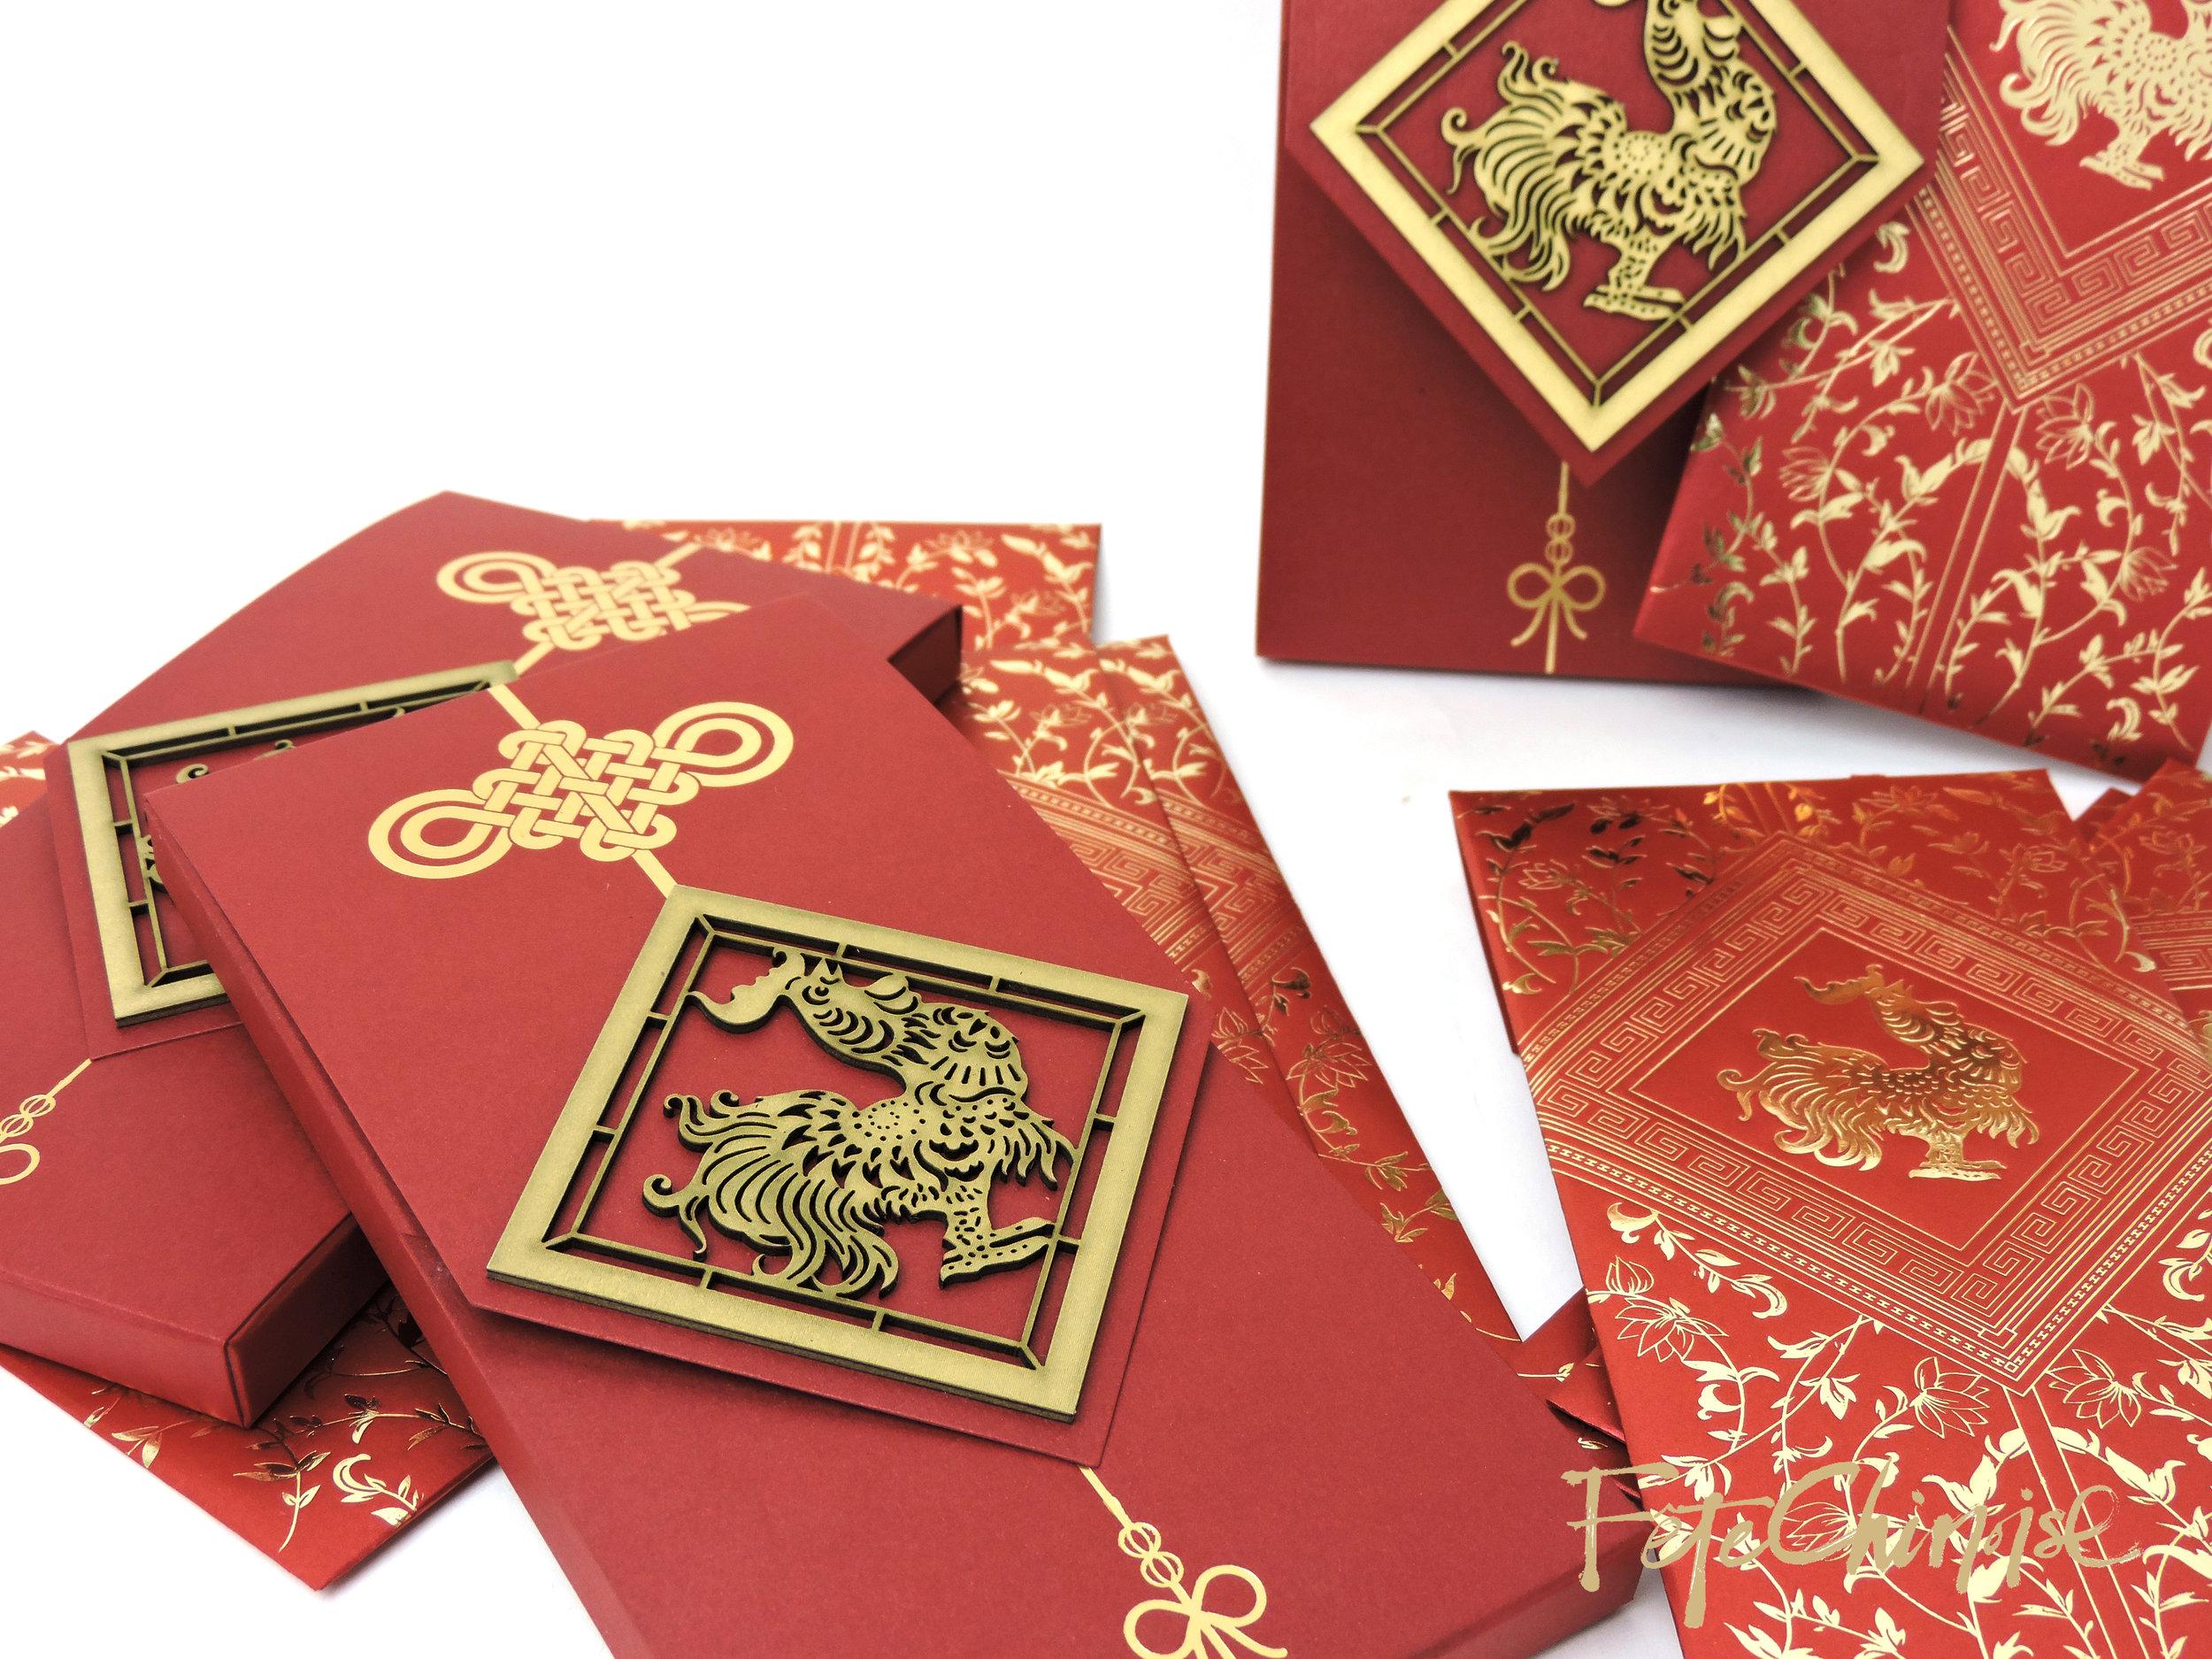 Birks_Chinese New Year Lucky Money Pockets 2017_January 1 2017_04.jpg